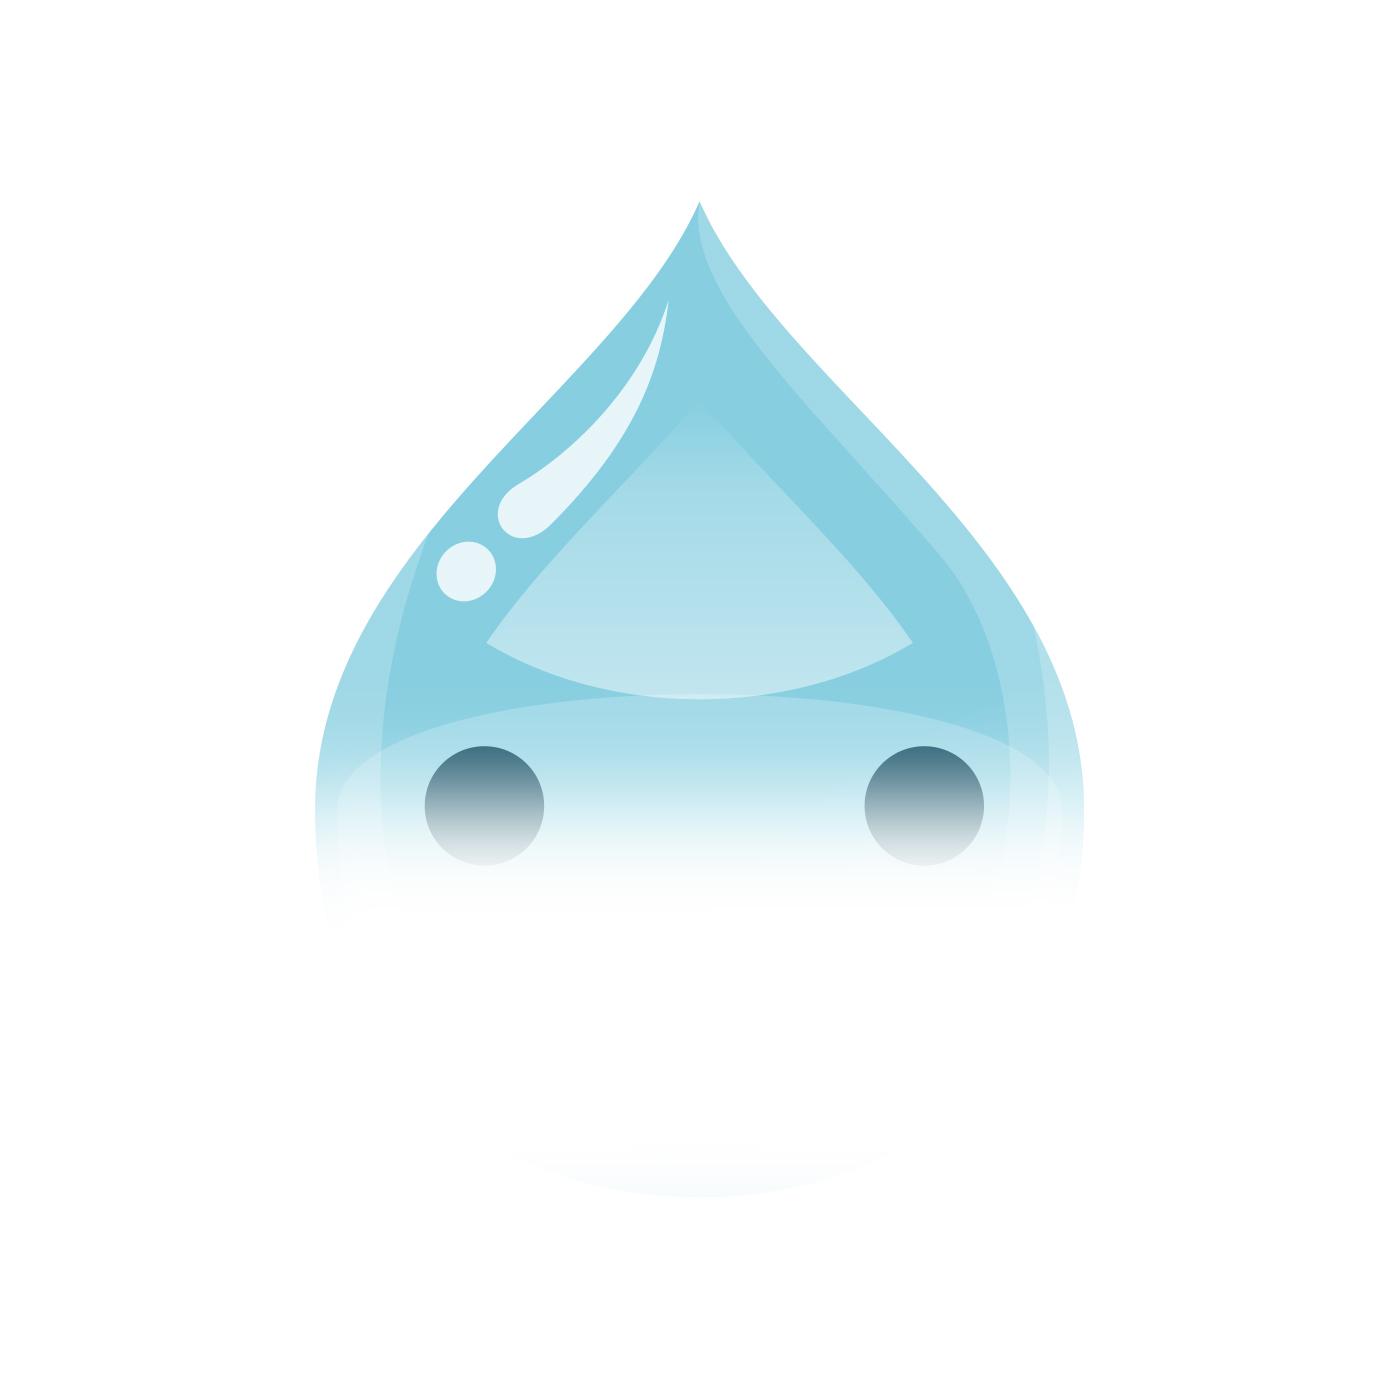 progettazione impianti di irrigazione a scomparsa brescia